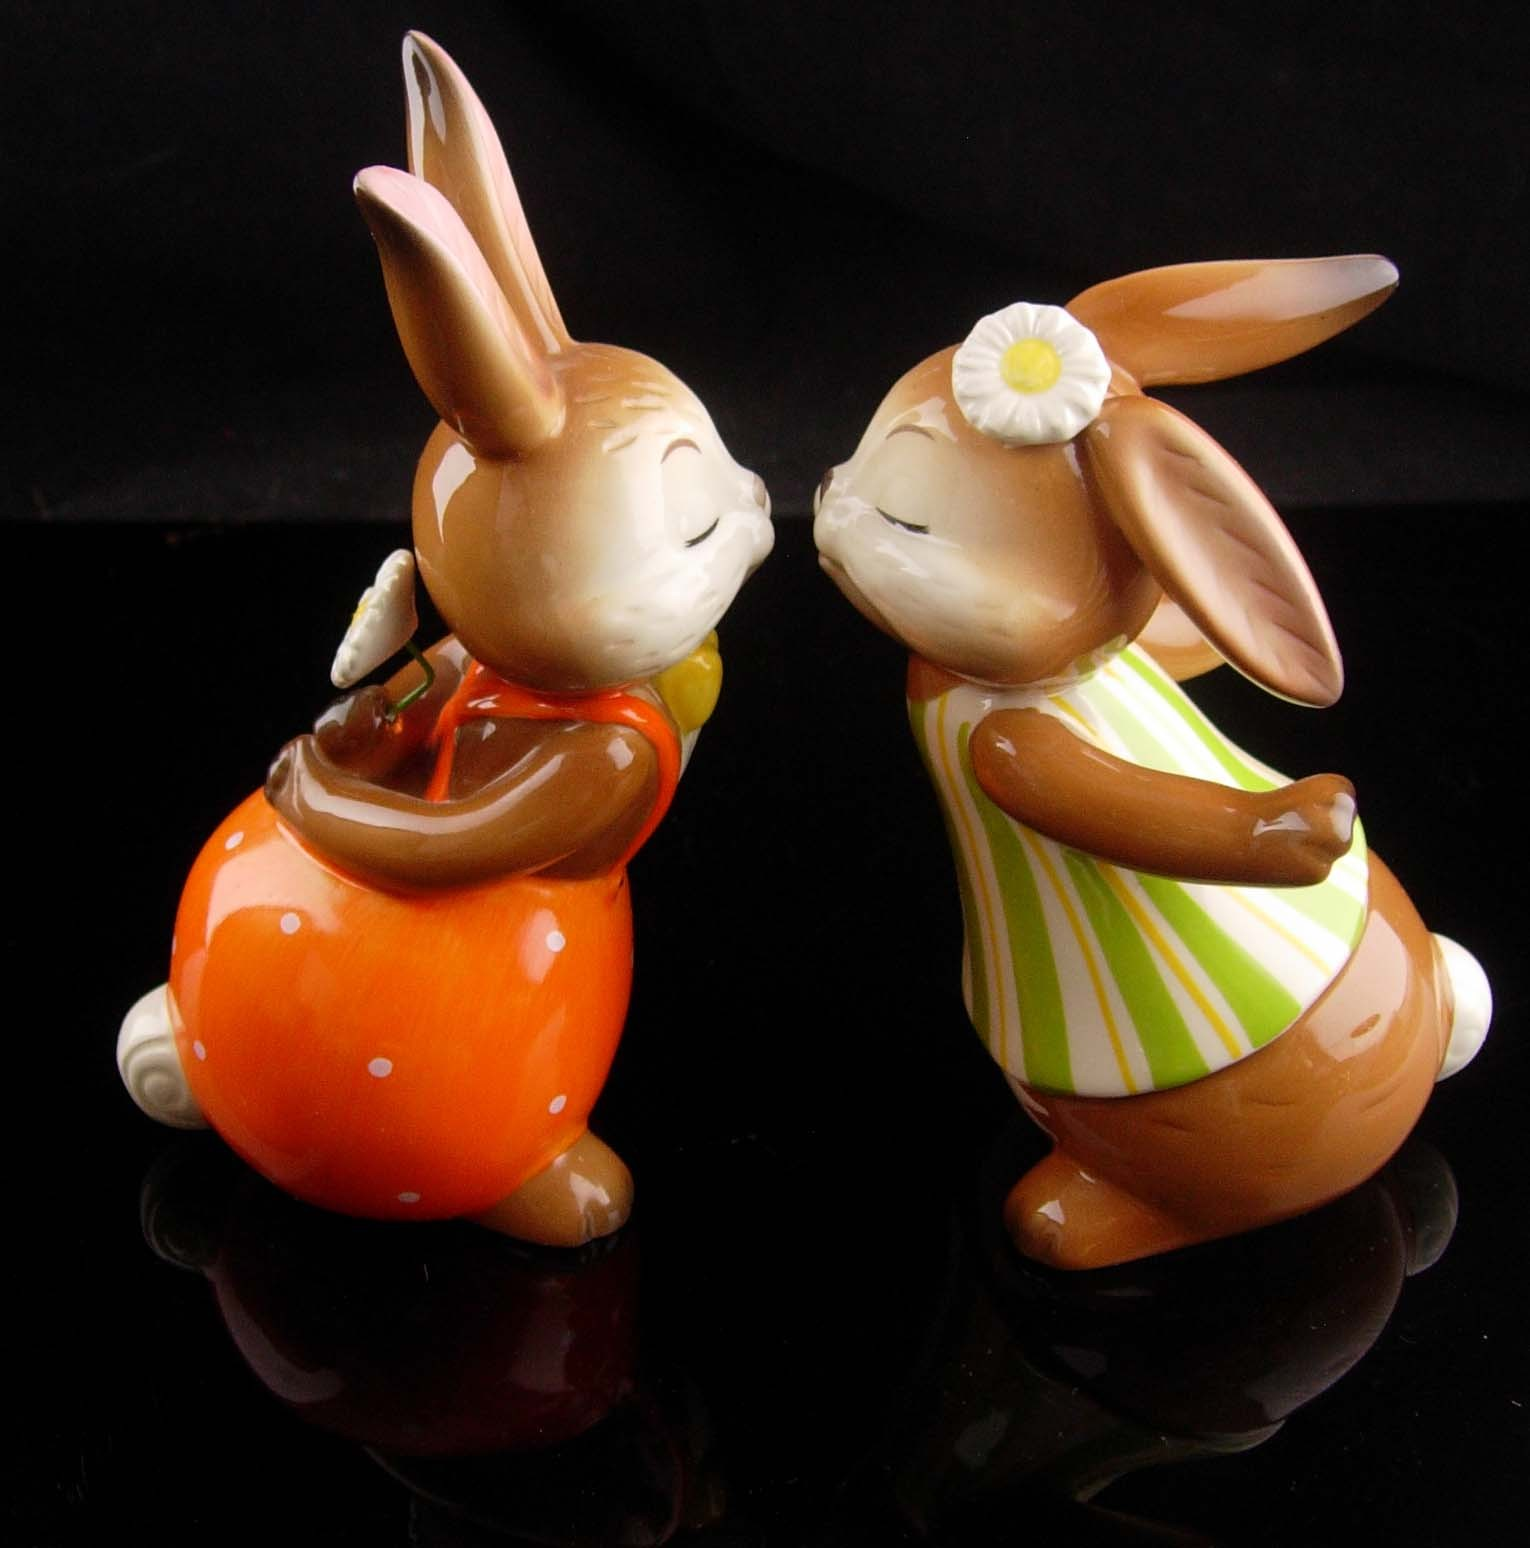 Vintage kissing bunny goebel - new mom gift - mothers day gift - german figurine image 2